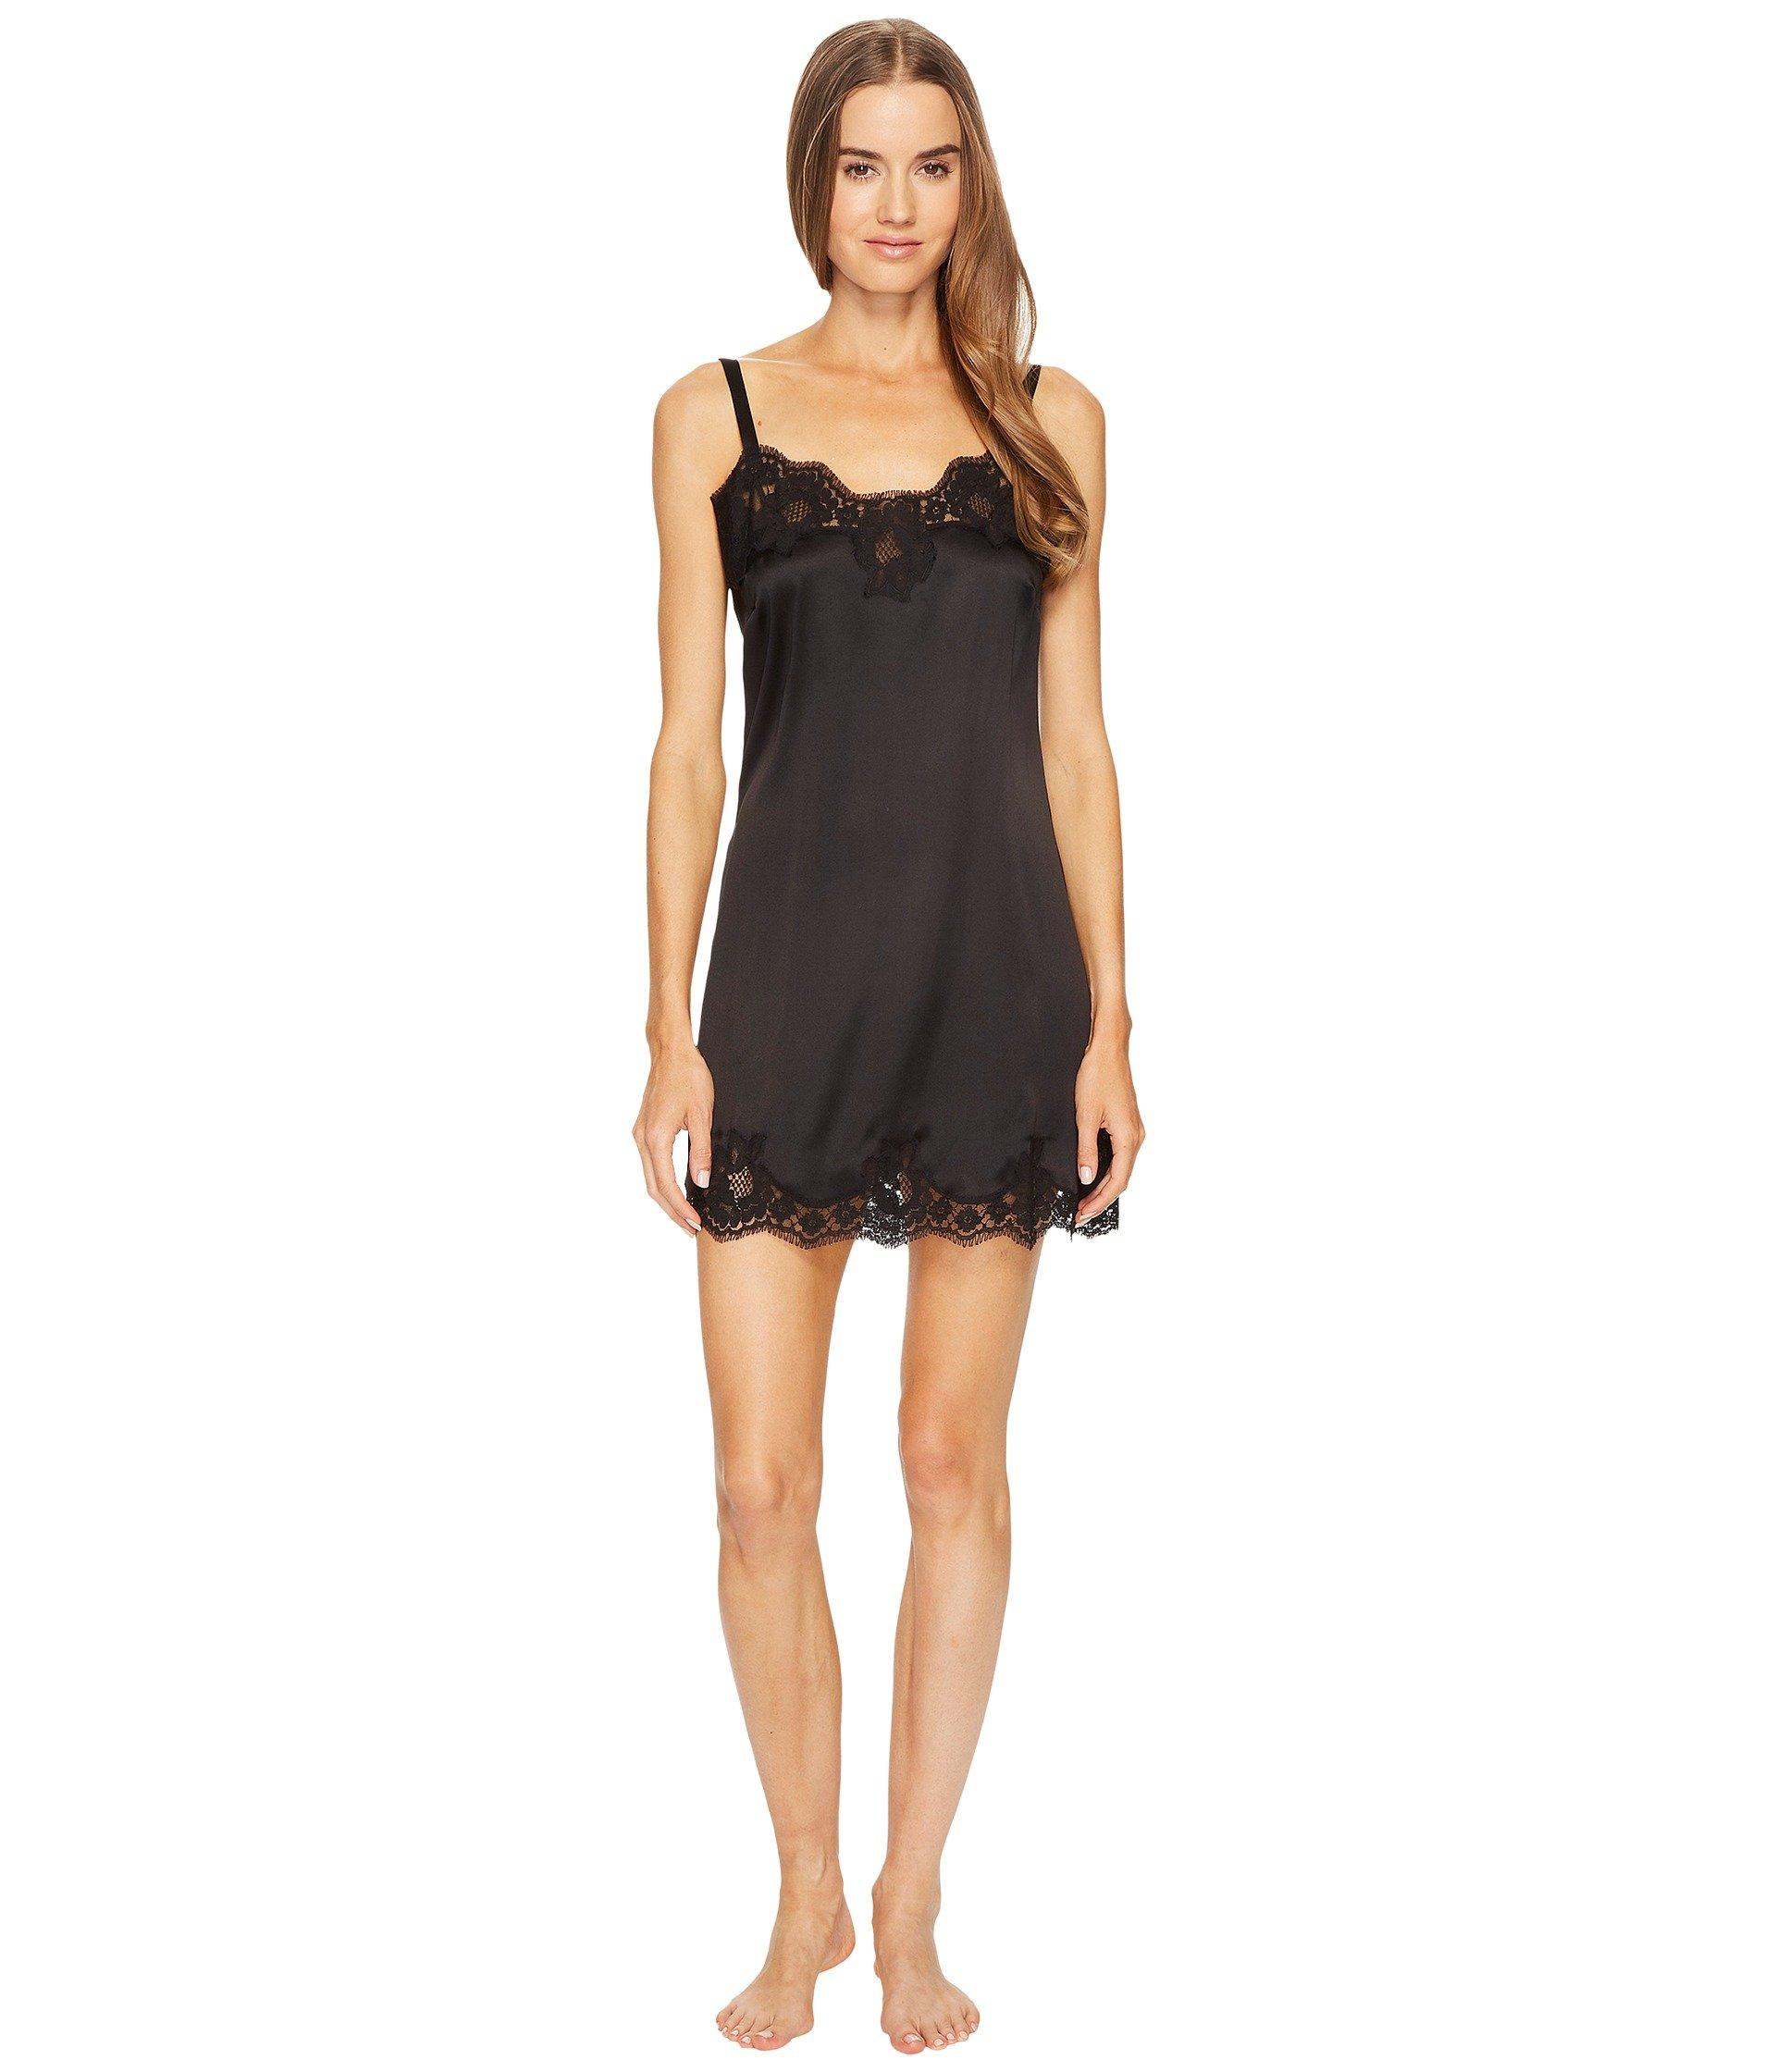 Lenceria Dolce andamp; Gabbana Stretch Satin Lace Long Cami Dress  + Dolce & Gabbana en VeoyCompro.net